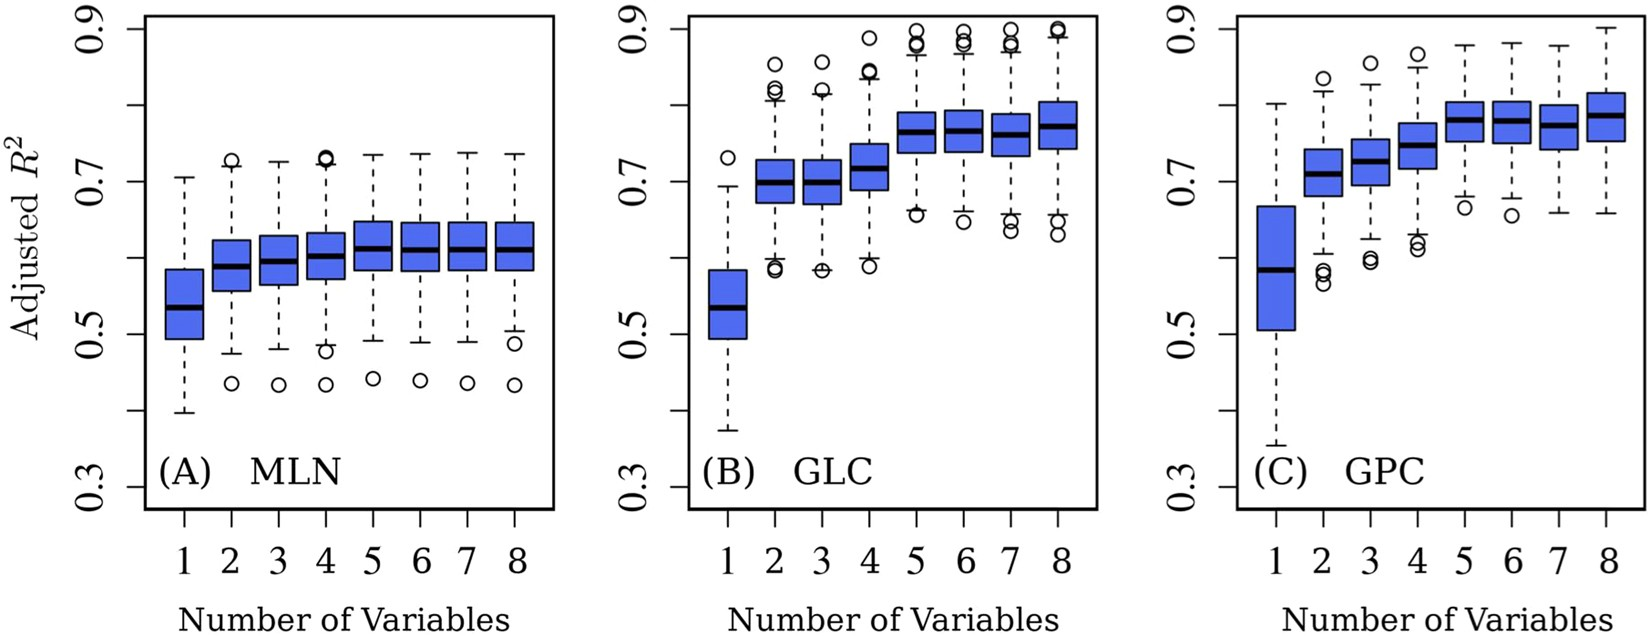 A Predictive Spatial Distribution Framework for Filovirus